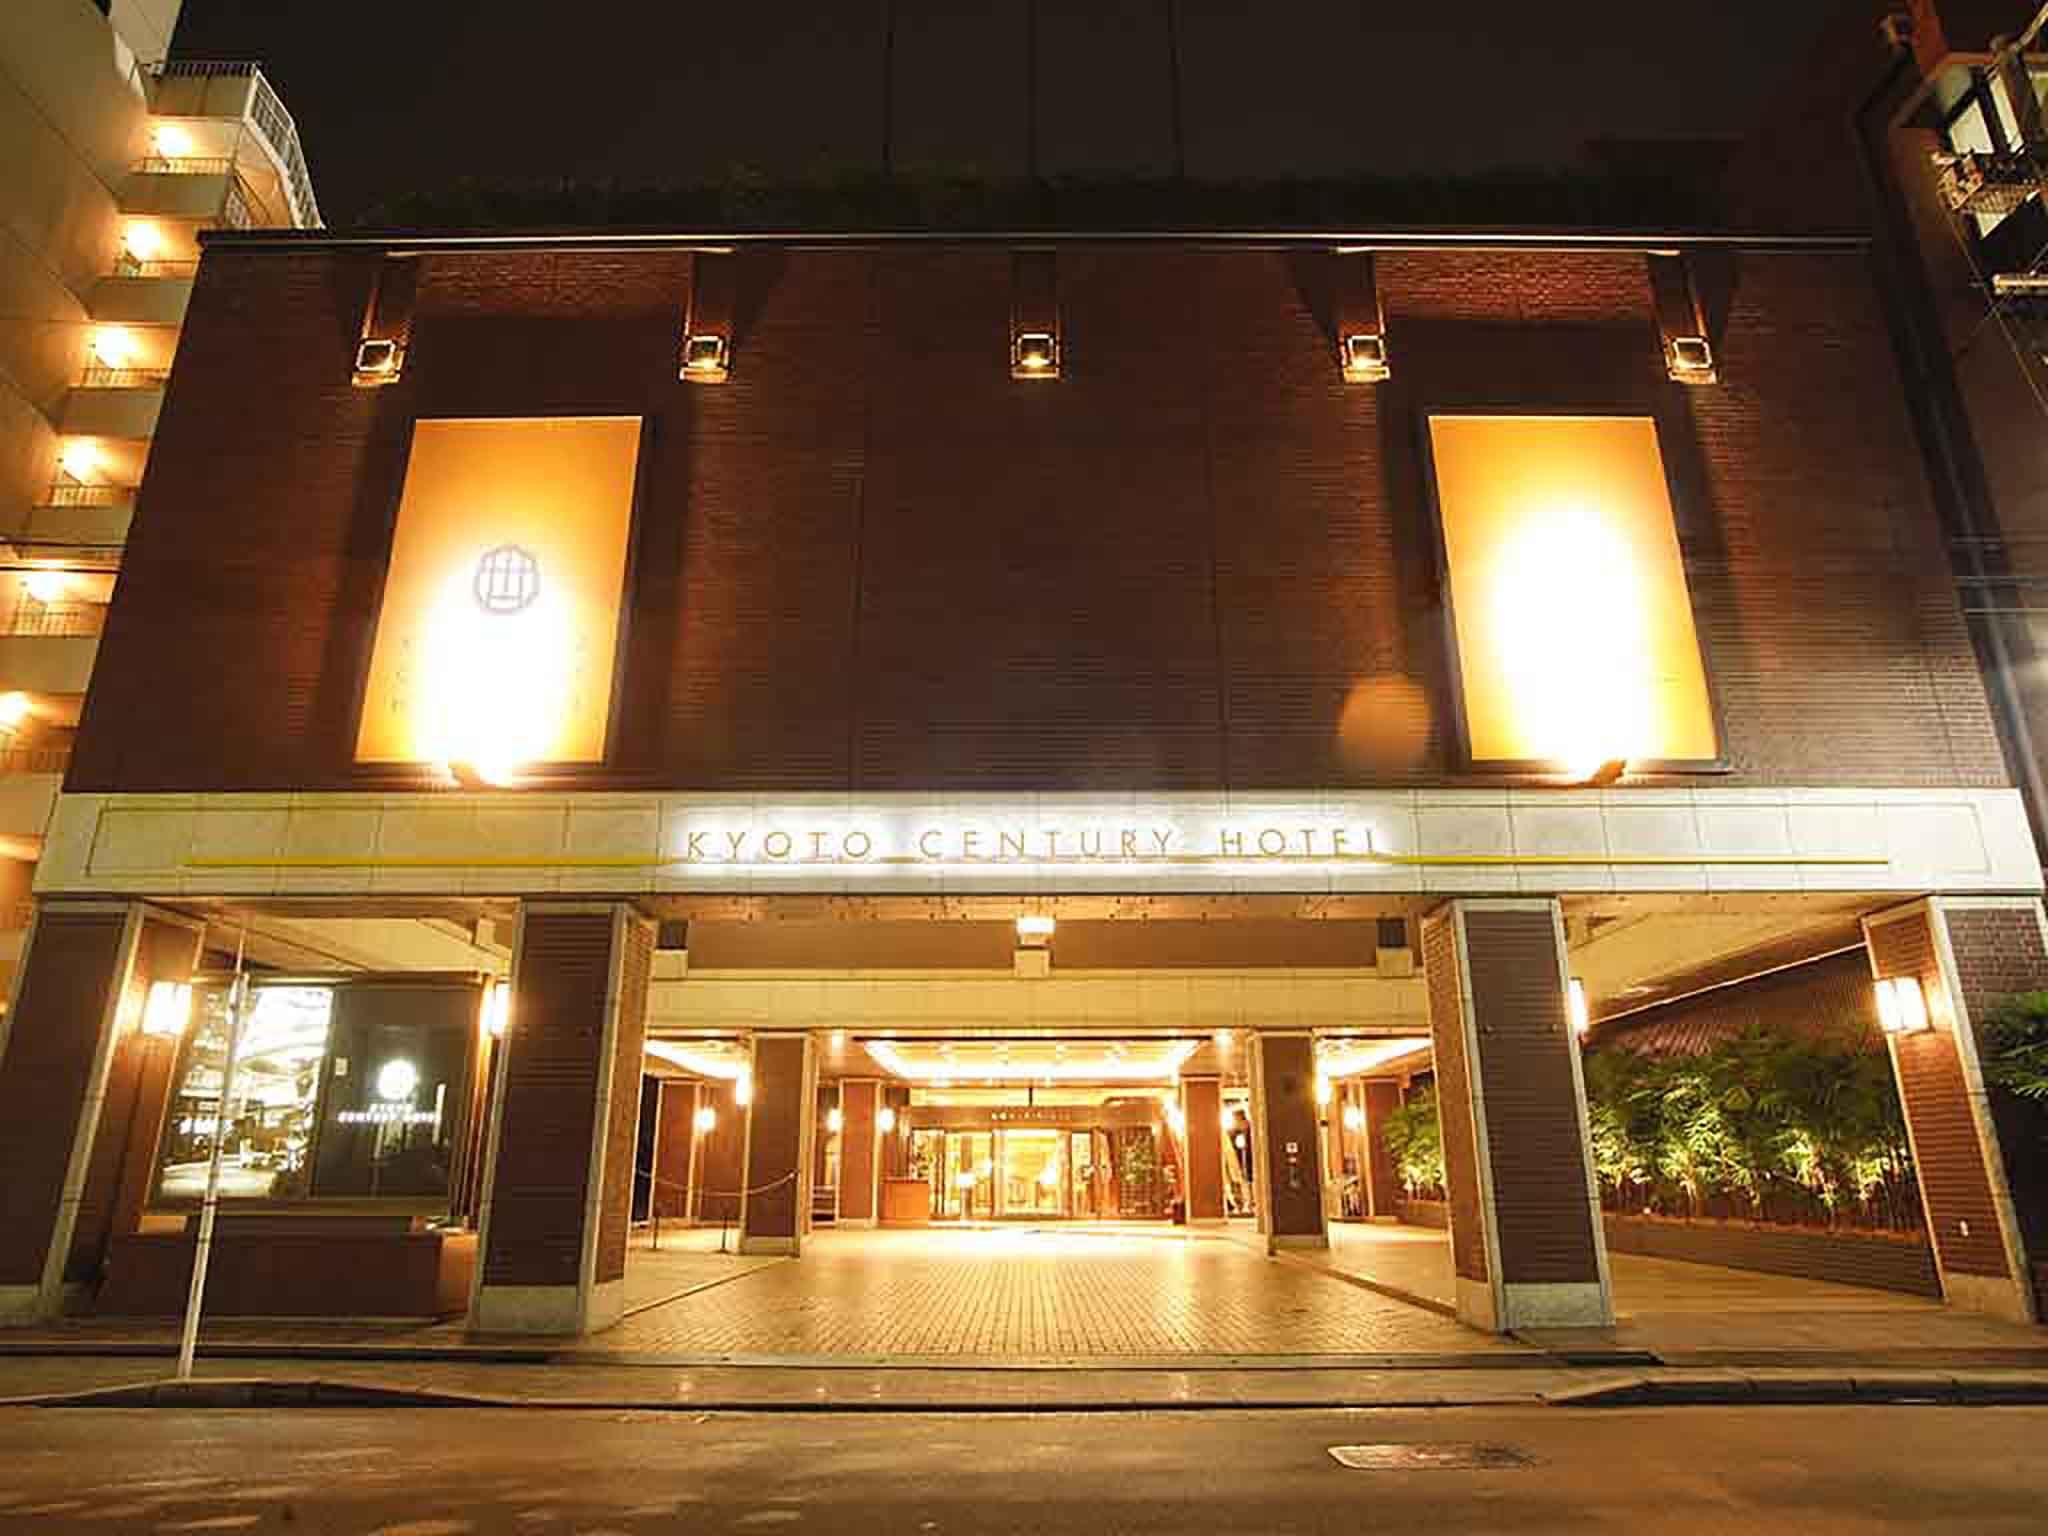 Hotel In Kyoto Century